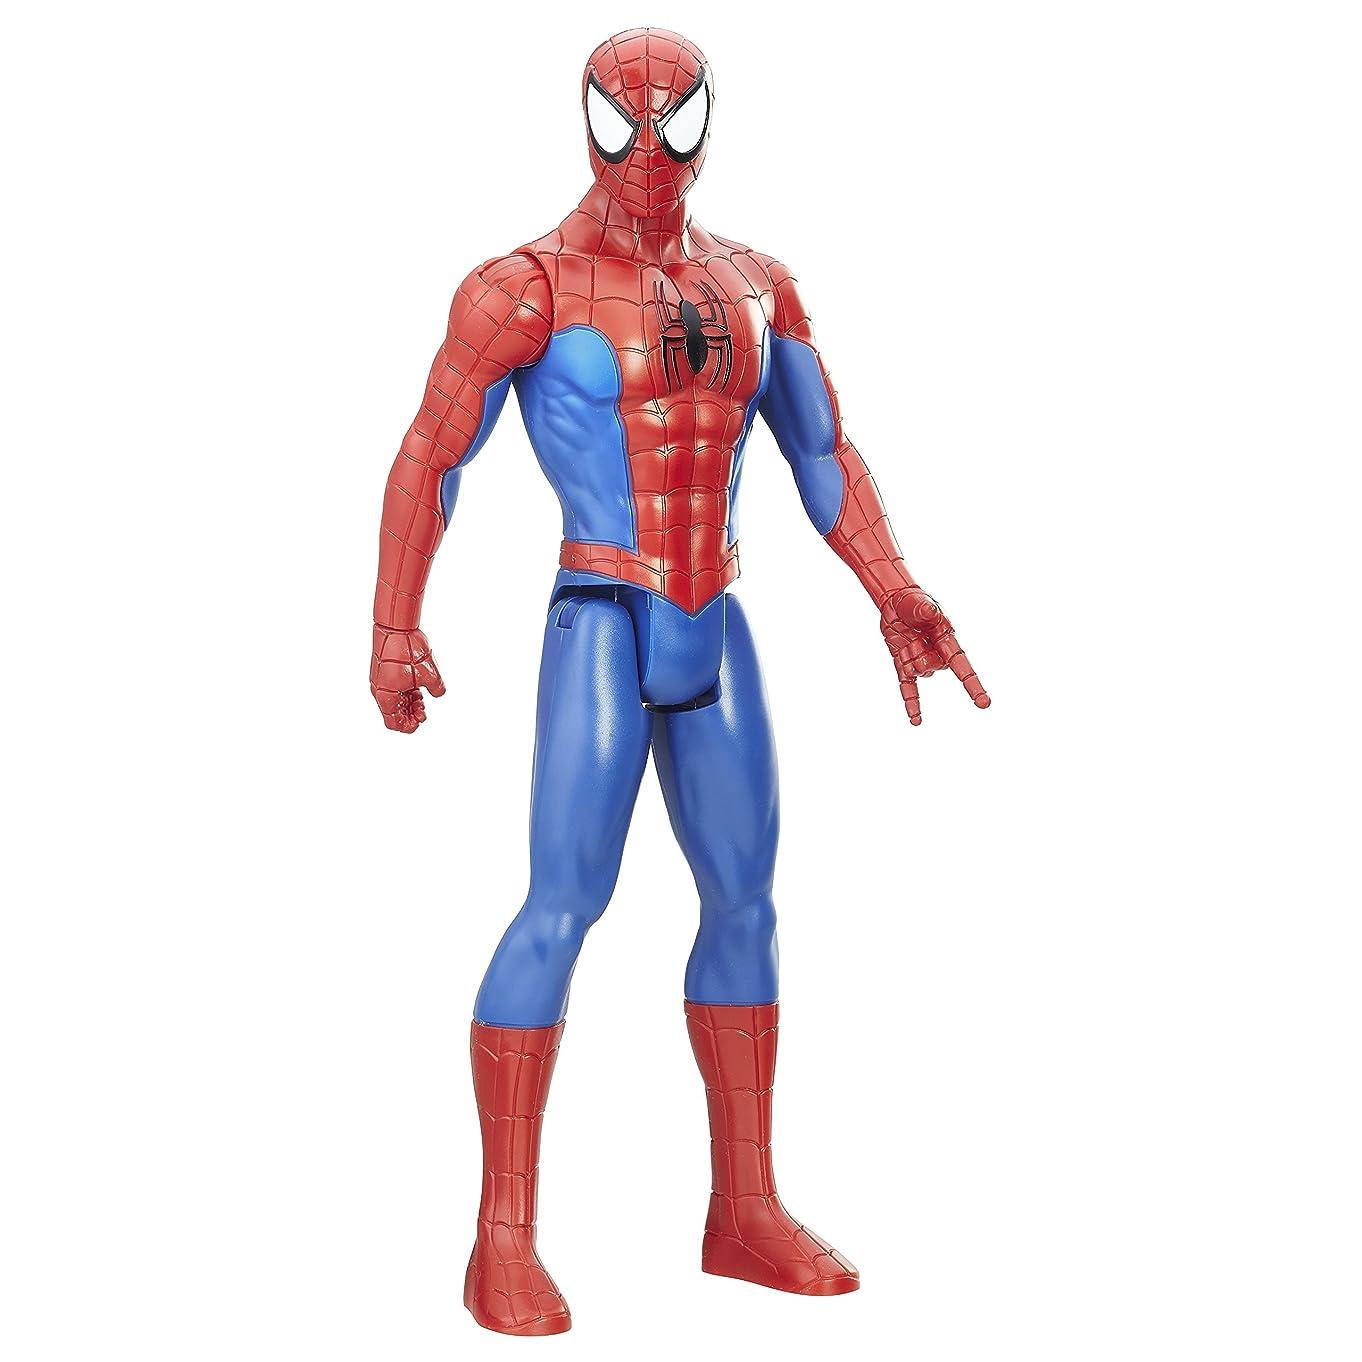 Spider-Man Titan Hero Series Figure with Titan Hero Power Fx Port E0649